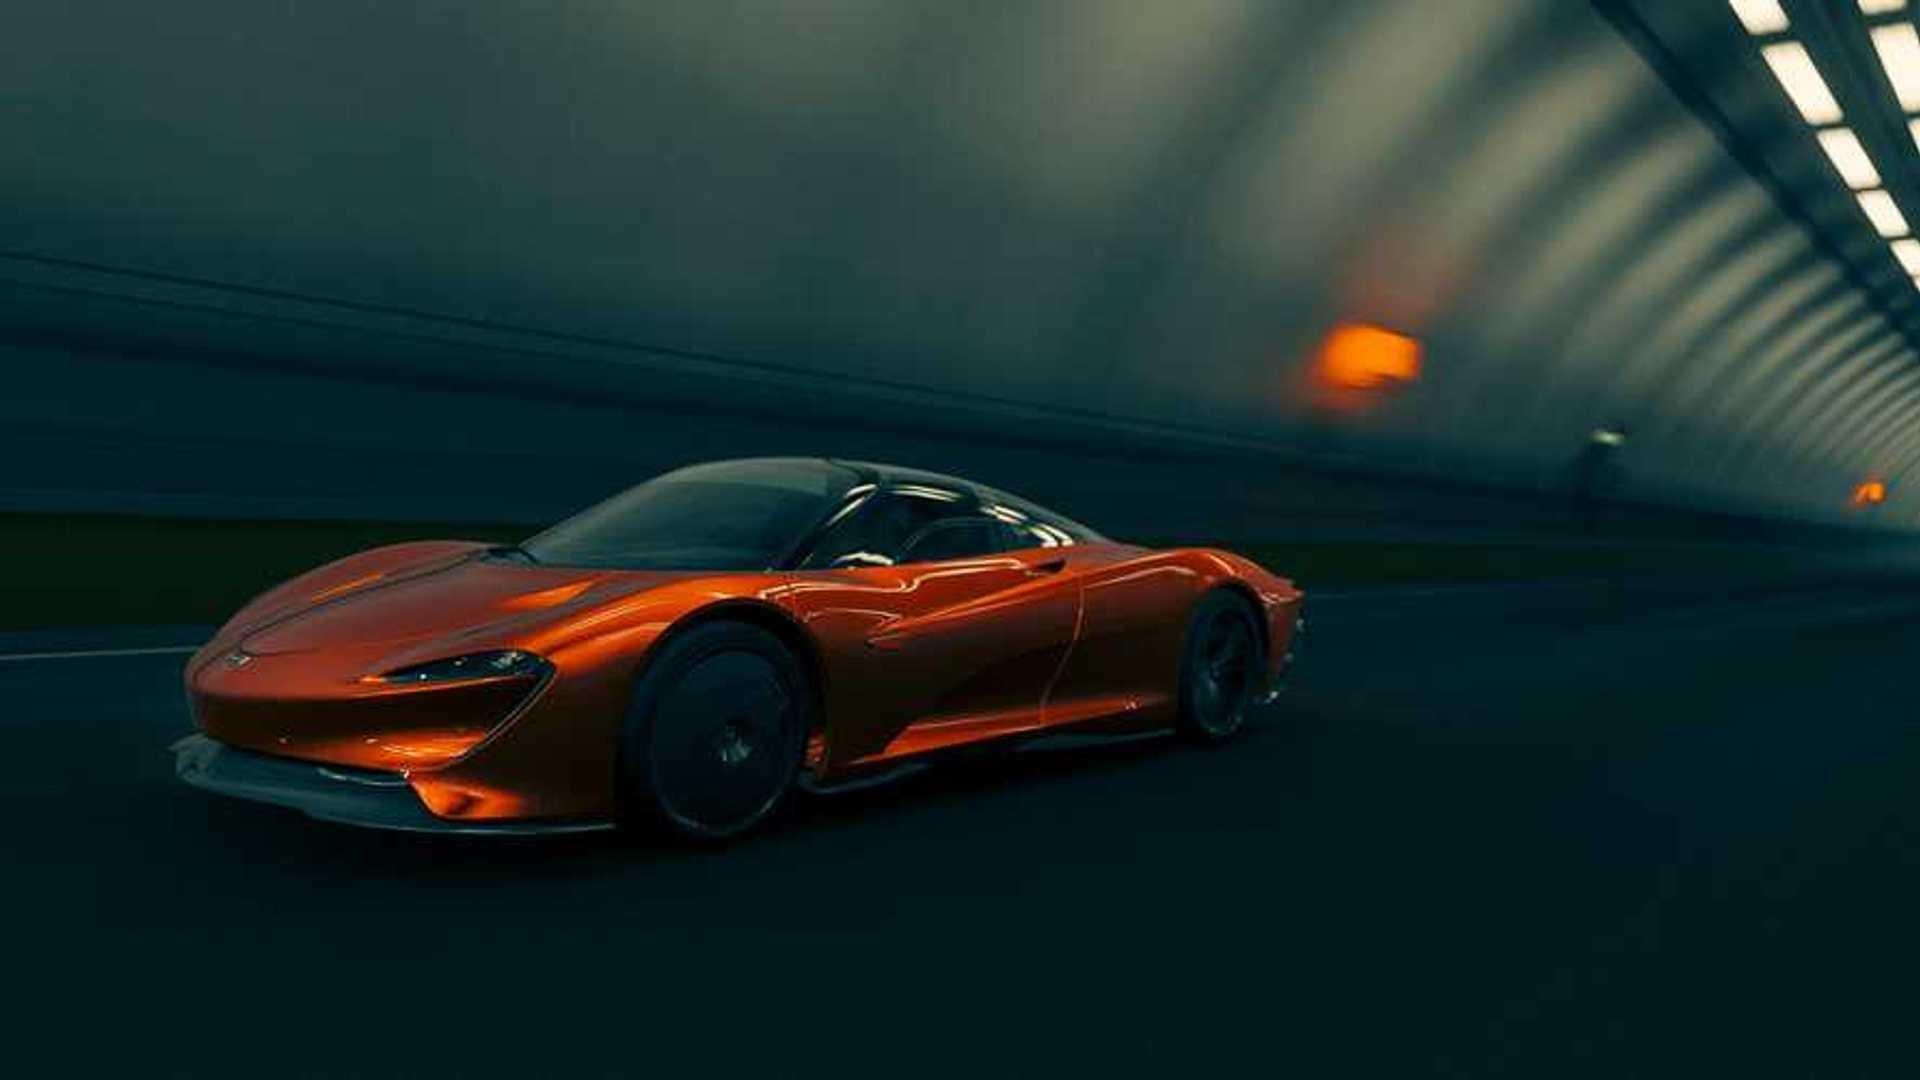 McLaren launches #DriveatHome initiative with Forza